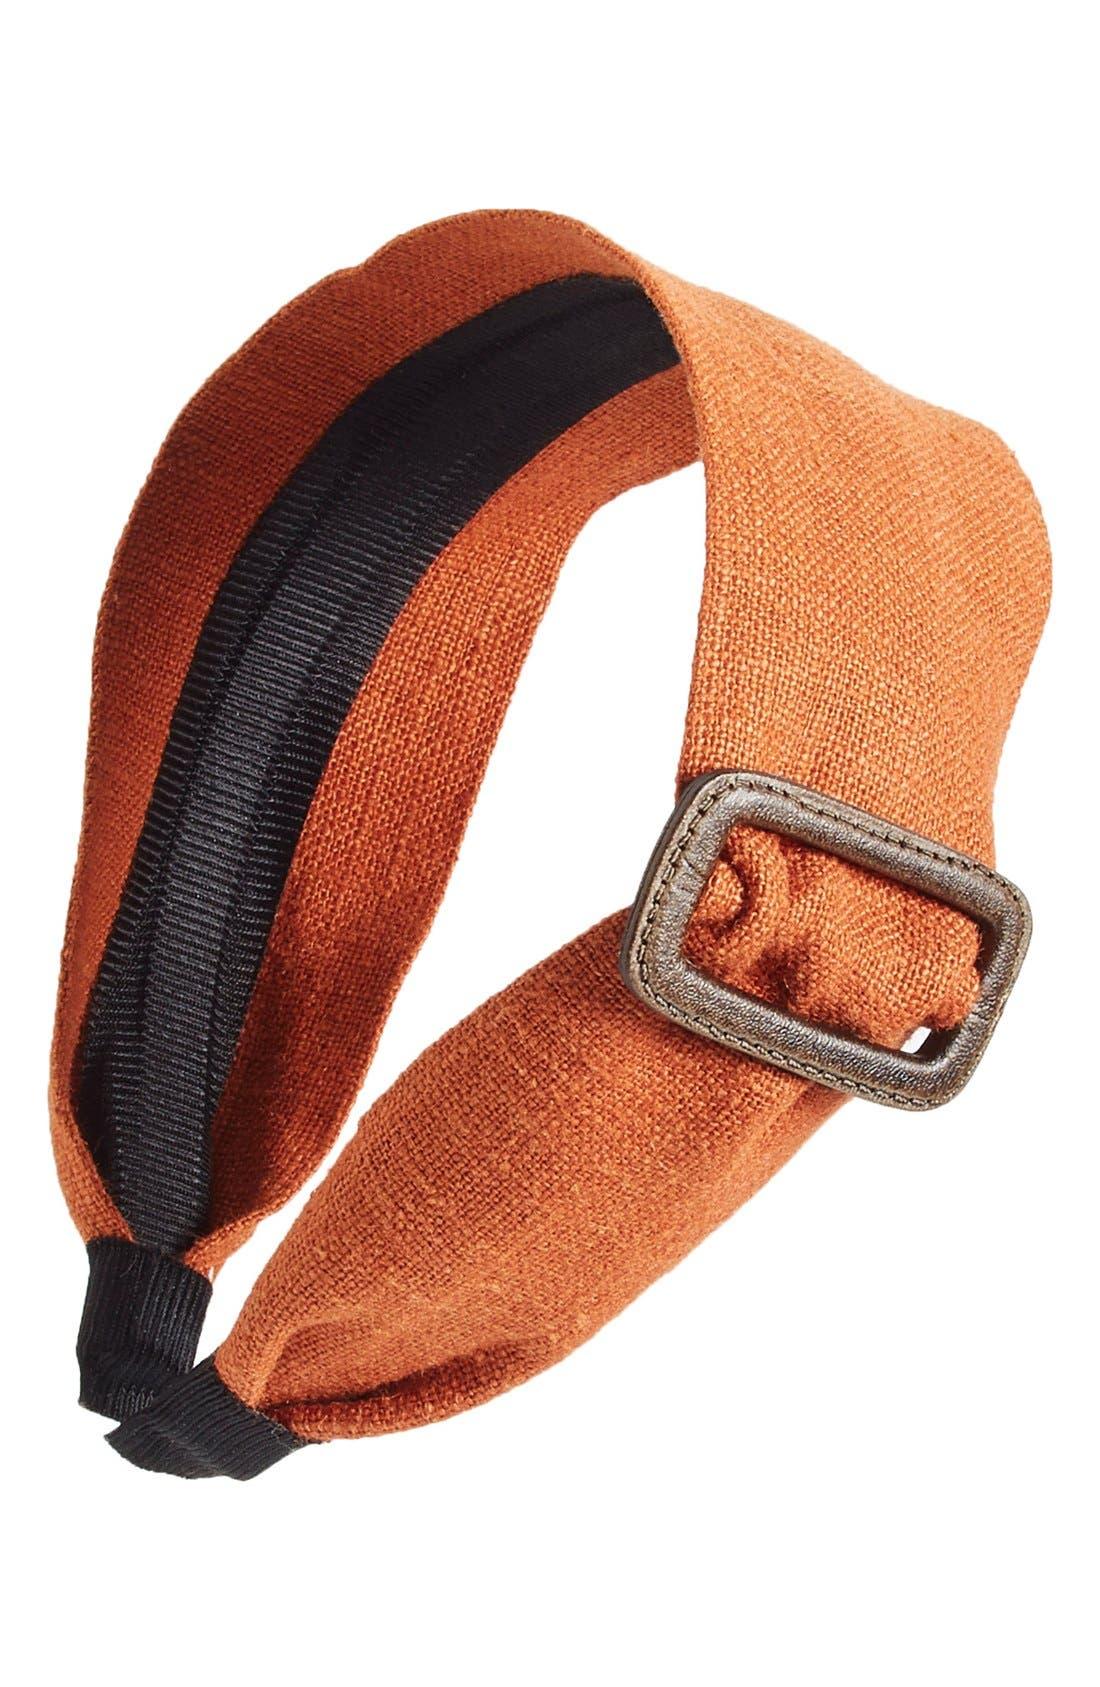 Main Image - Ficcare Buckle Headband